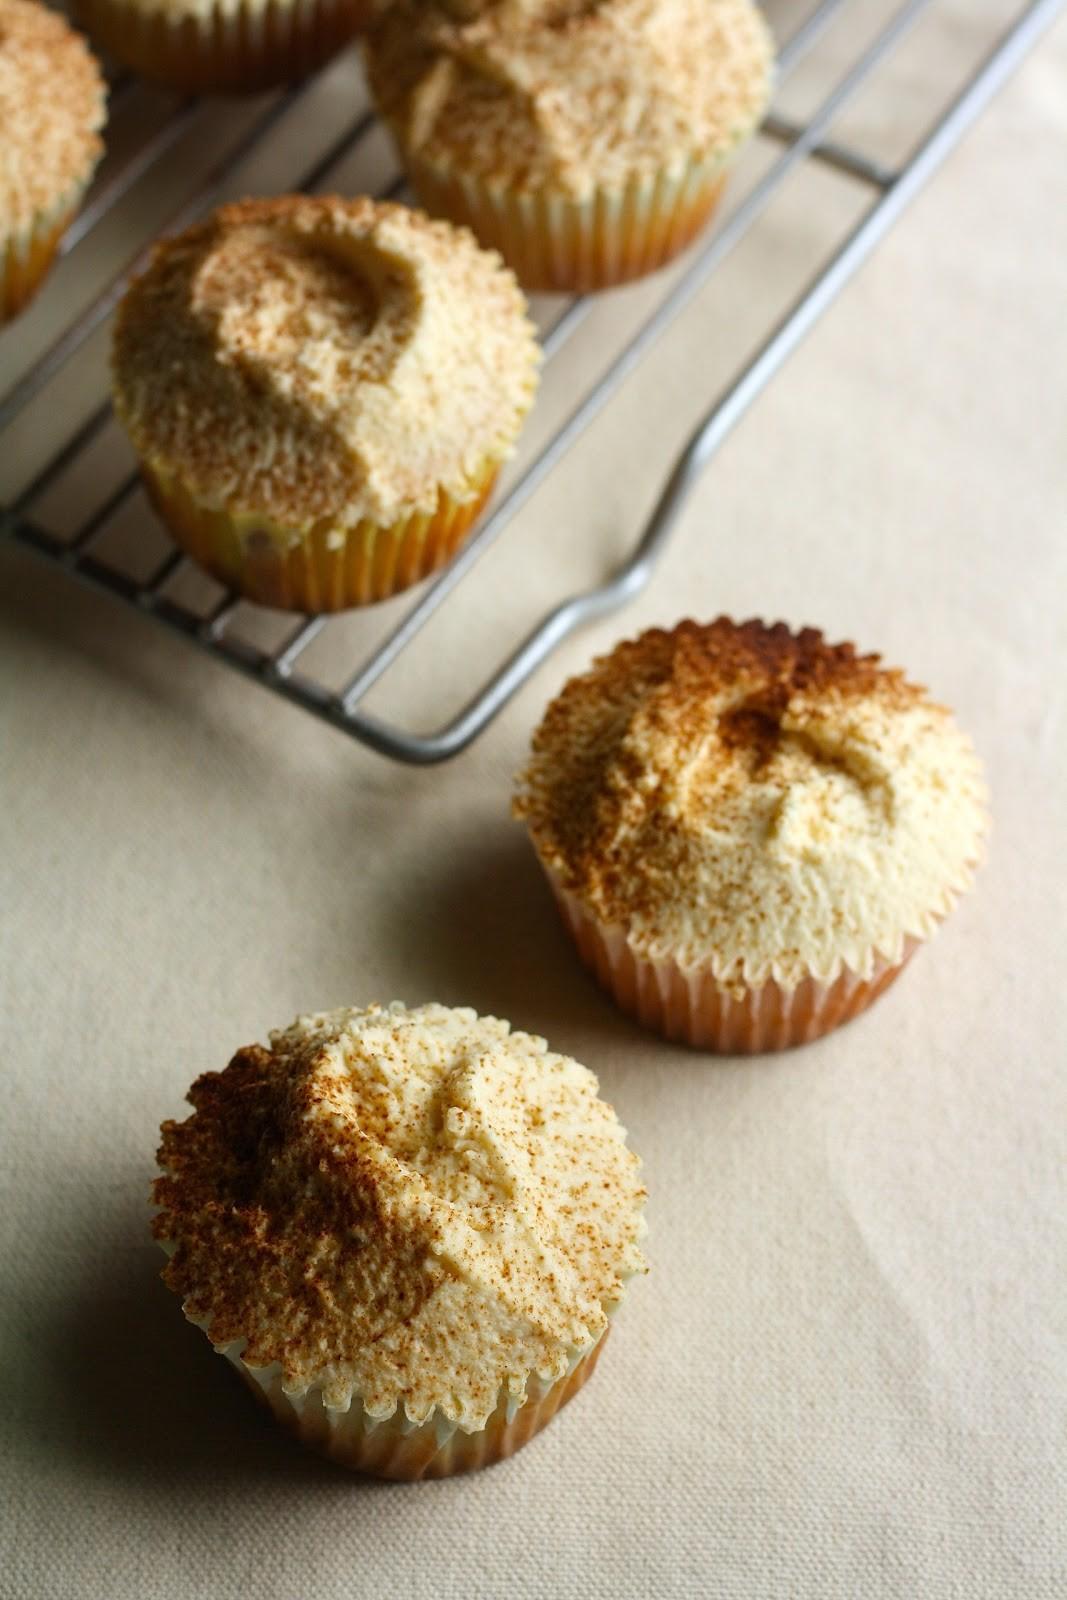 Thanksgiving Pumpkin Cupcakes recipe from The Hummingbird Baker